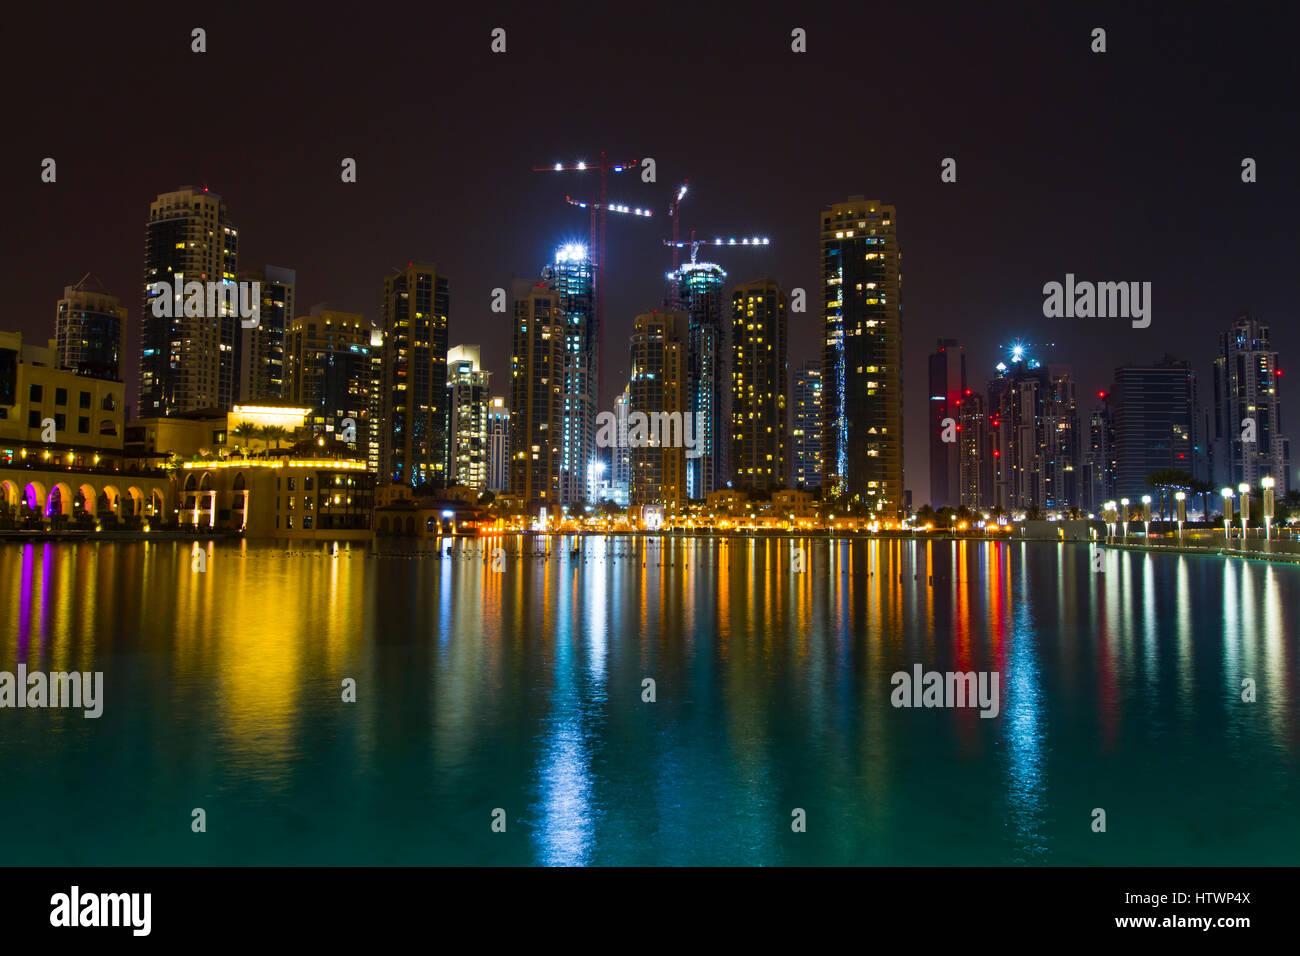 Skyscrapers and Burj Khalifa lake at night. Dubai city.  Dubai. United Arab Emirates. - Stock Image